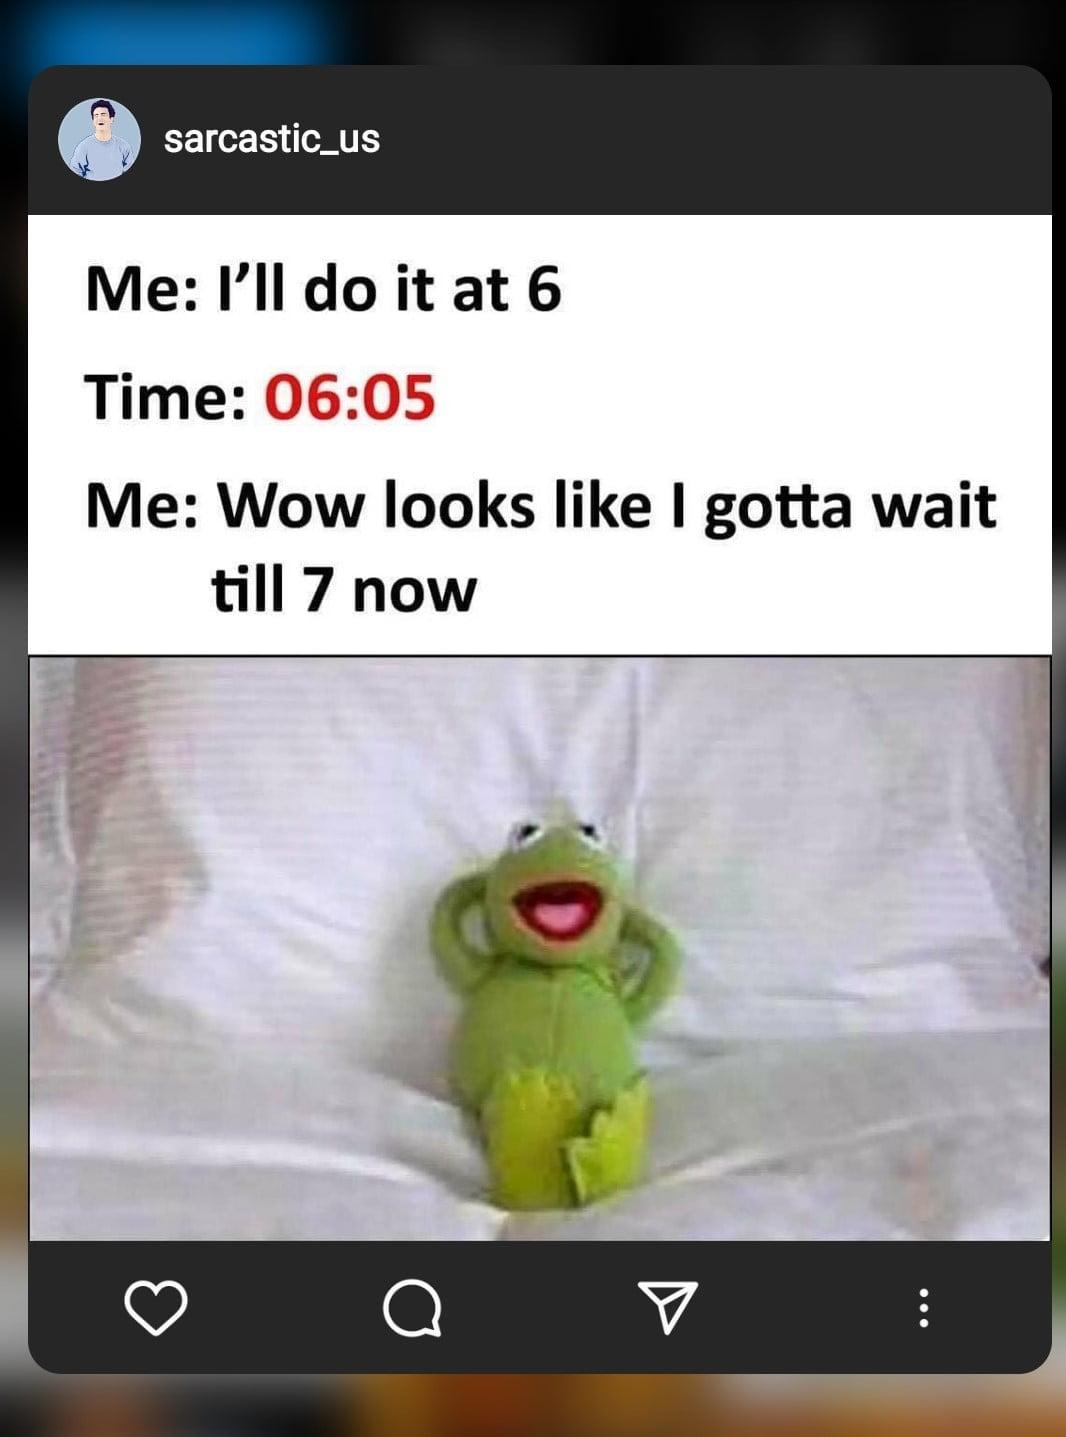 @sarcastic Us  -  sarcastic us - 21 Top MEME INSTAGRAM ACCOUNTS 2021 – Funny & Epic Memes Daily